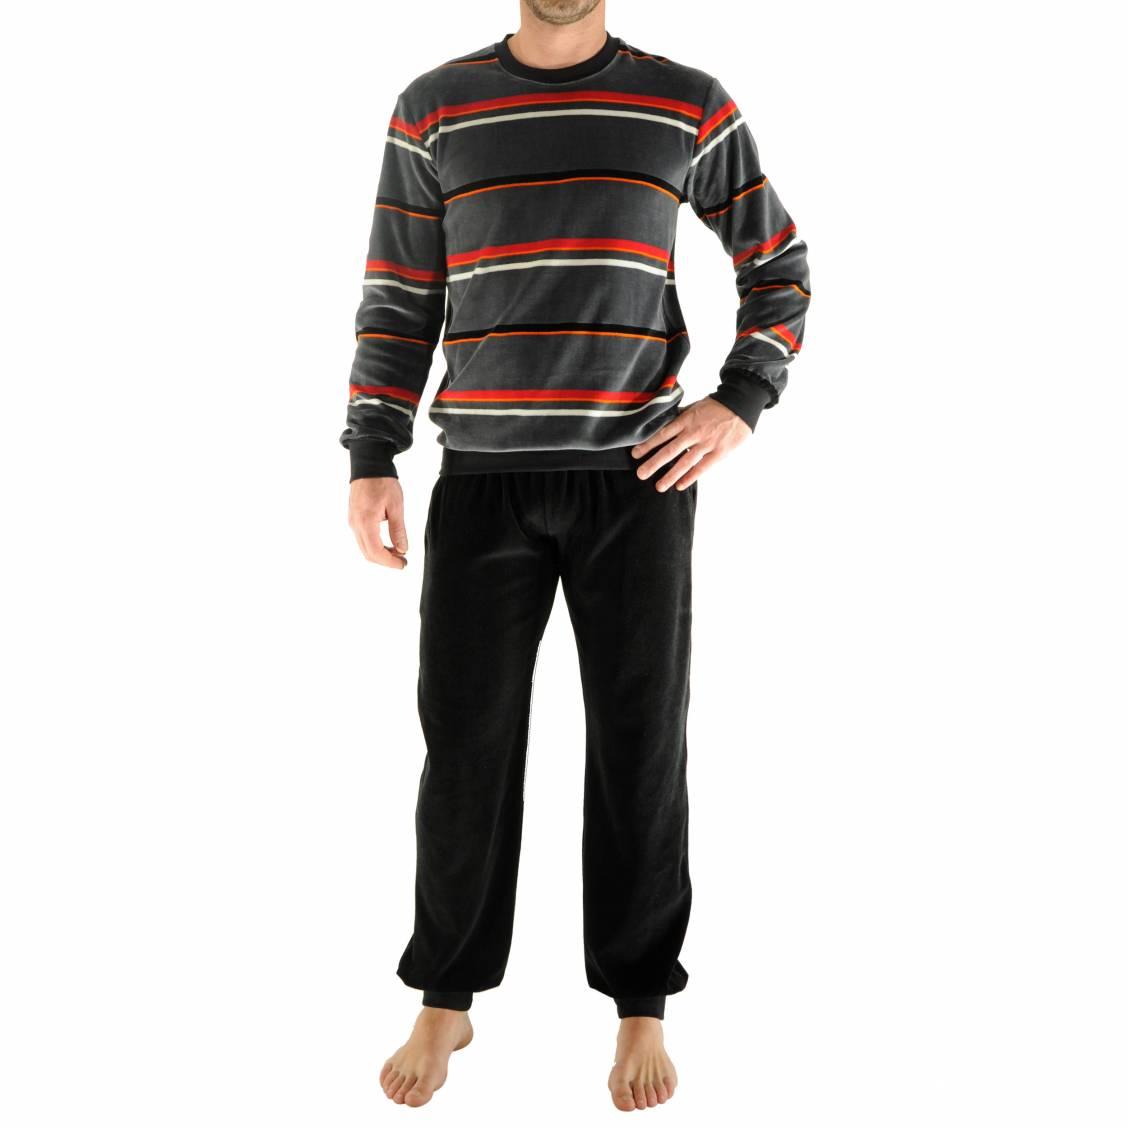 pyjama jogging gao christian cane en velours sweat col rond gris rayures et pantalon noir. Black Bedroom Furniture Sets. Home Design Ideas